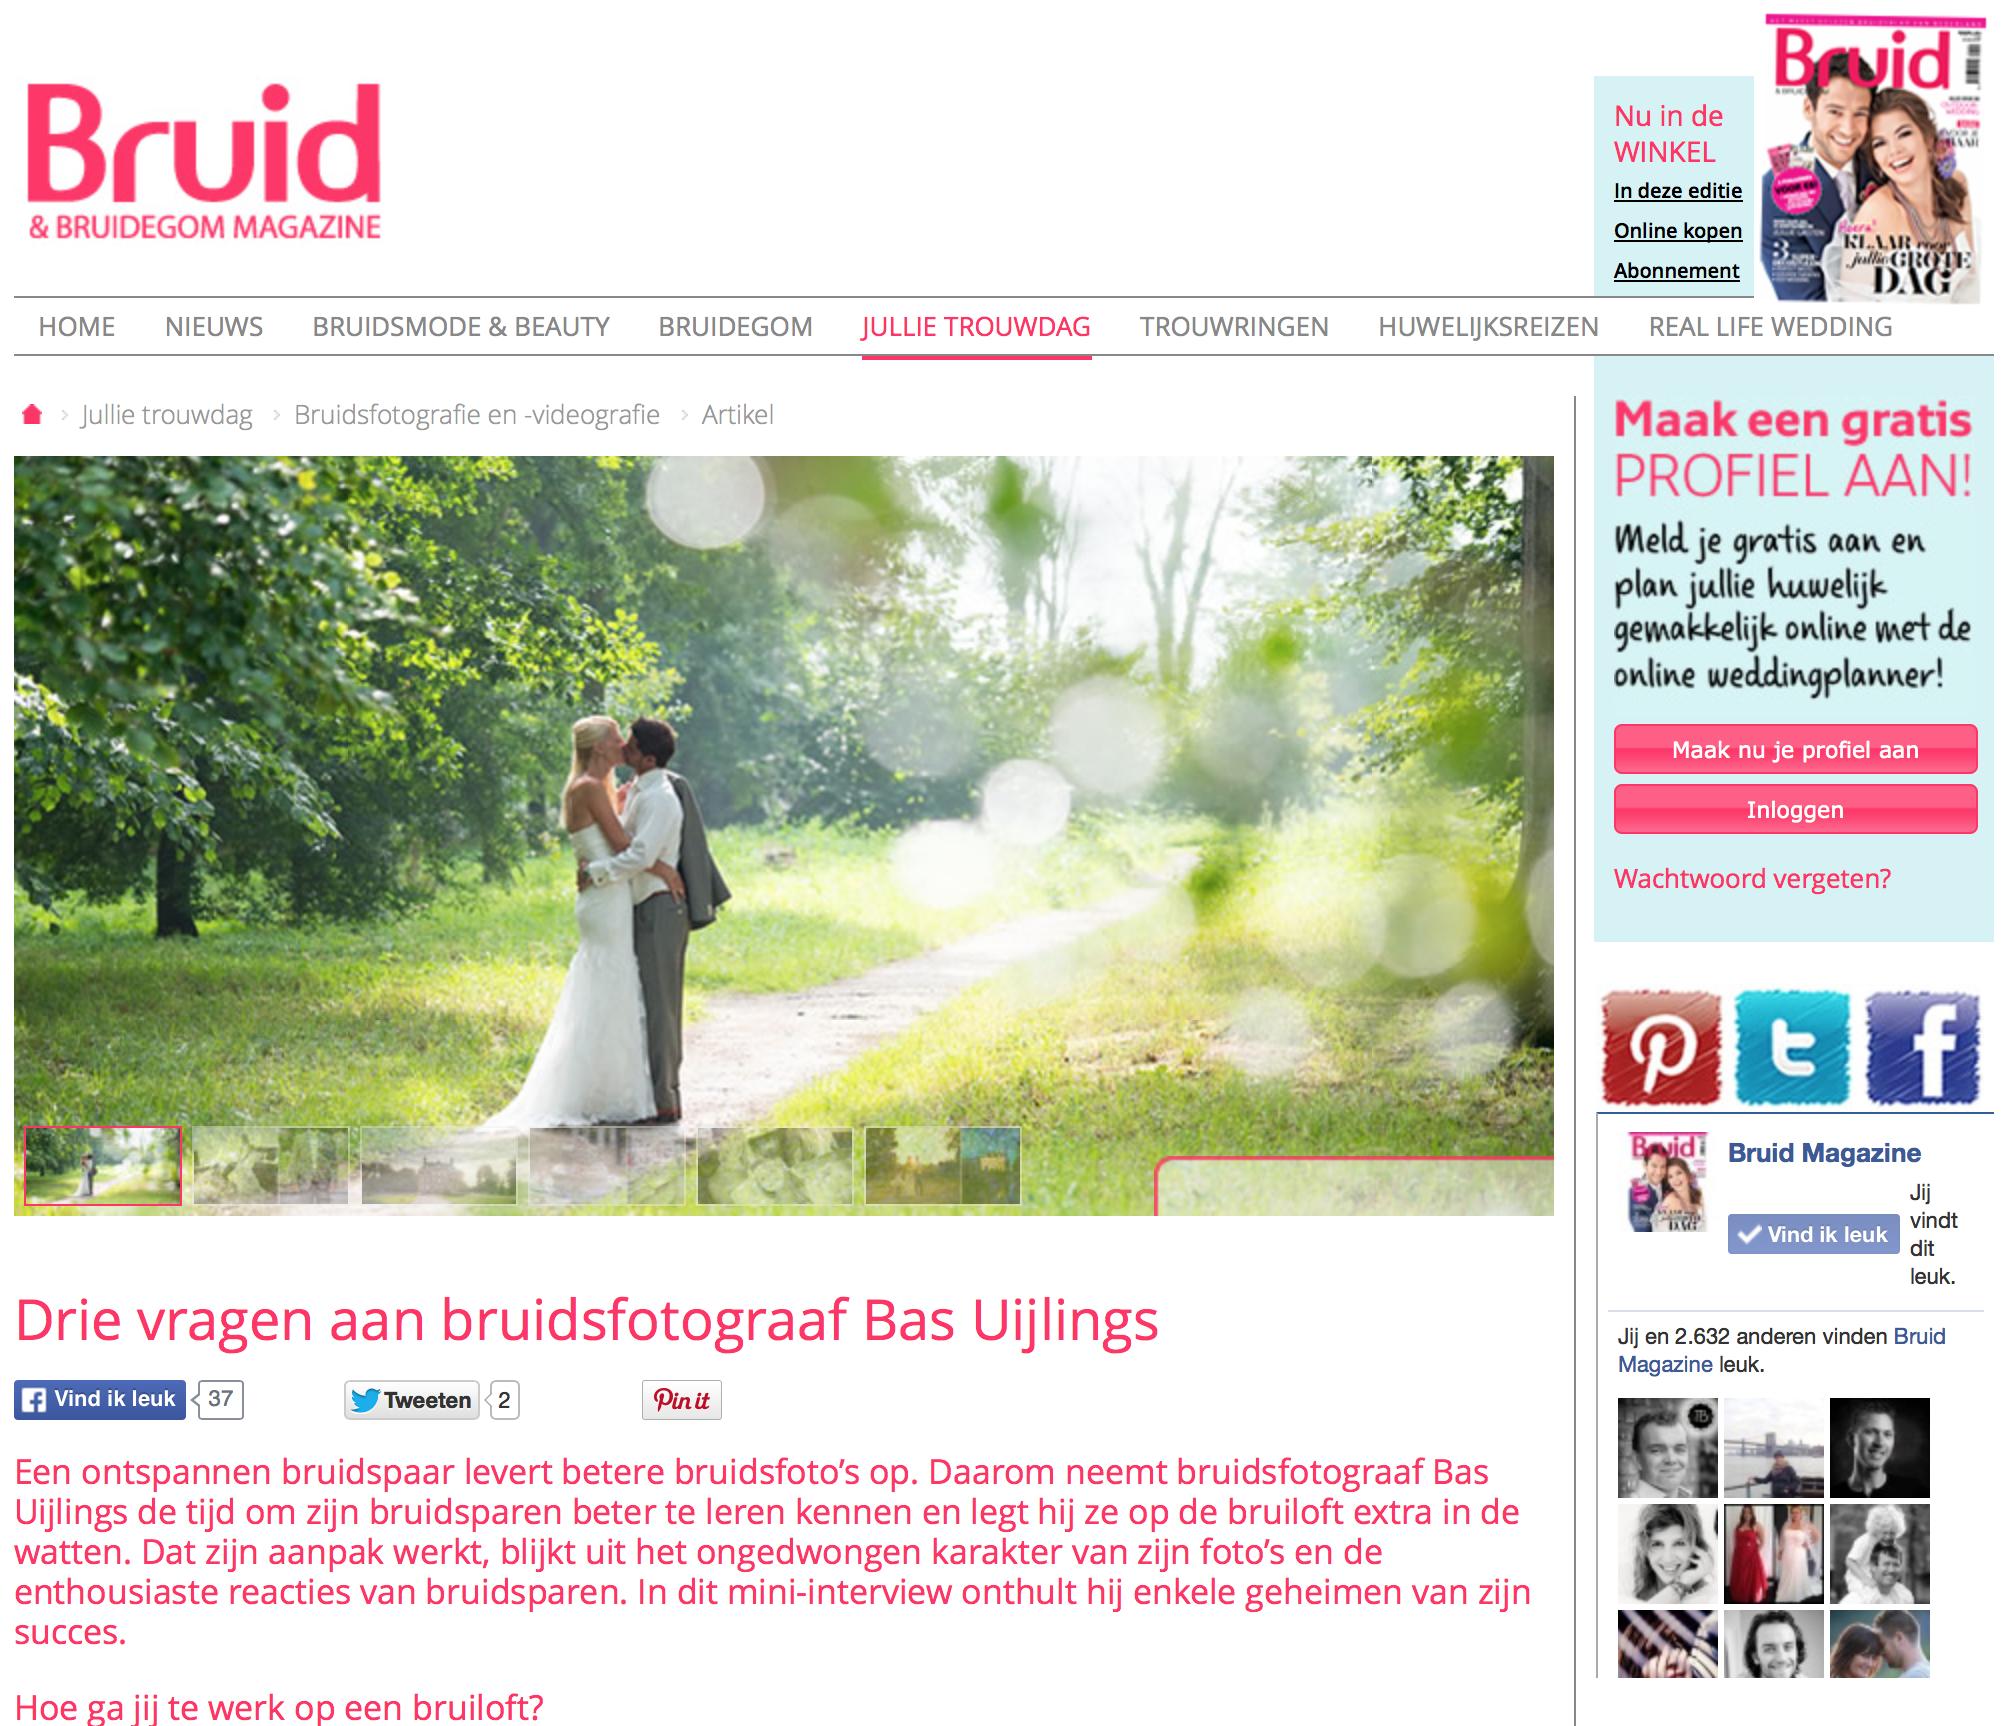 Publicatie Bruid en Bruidegom